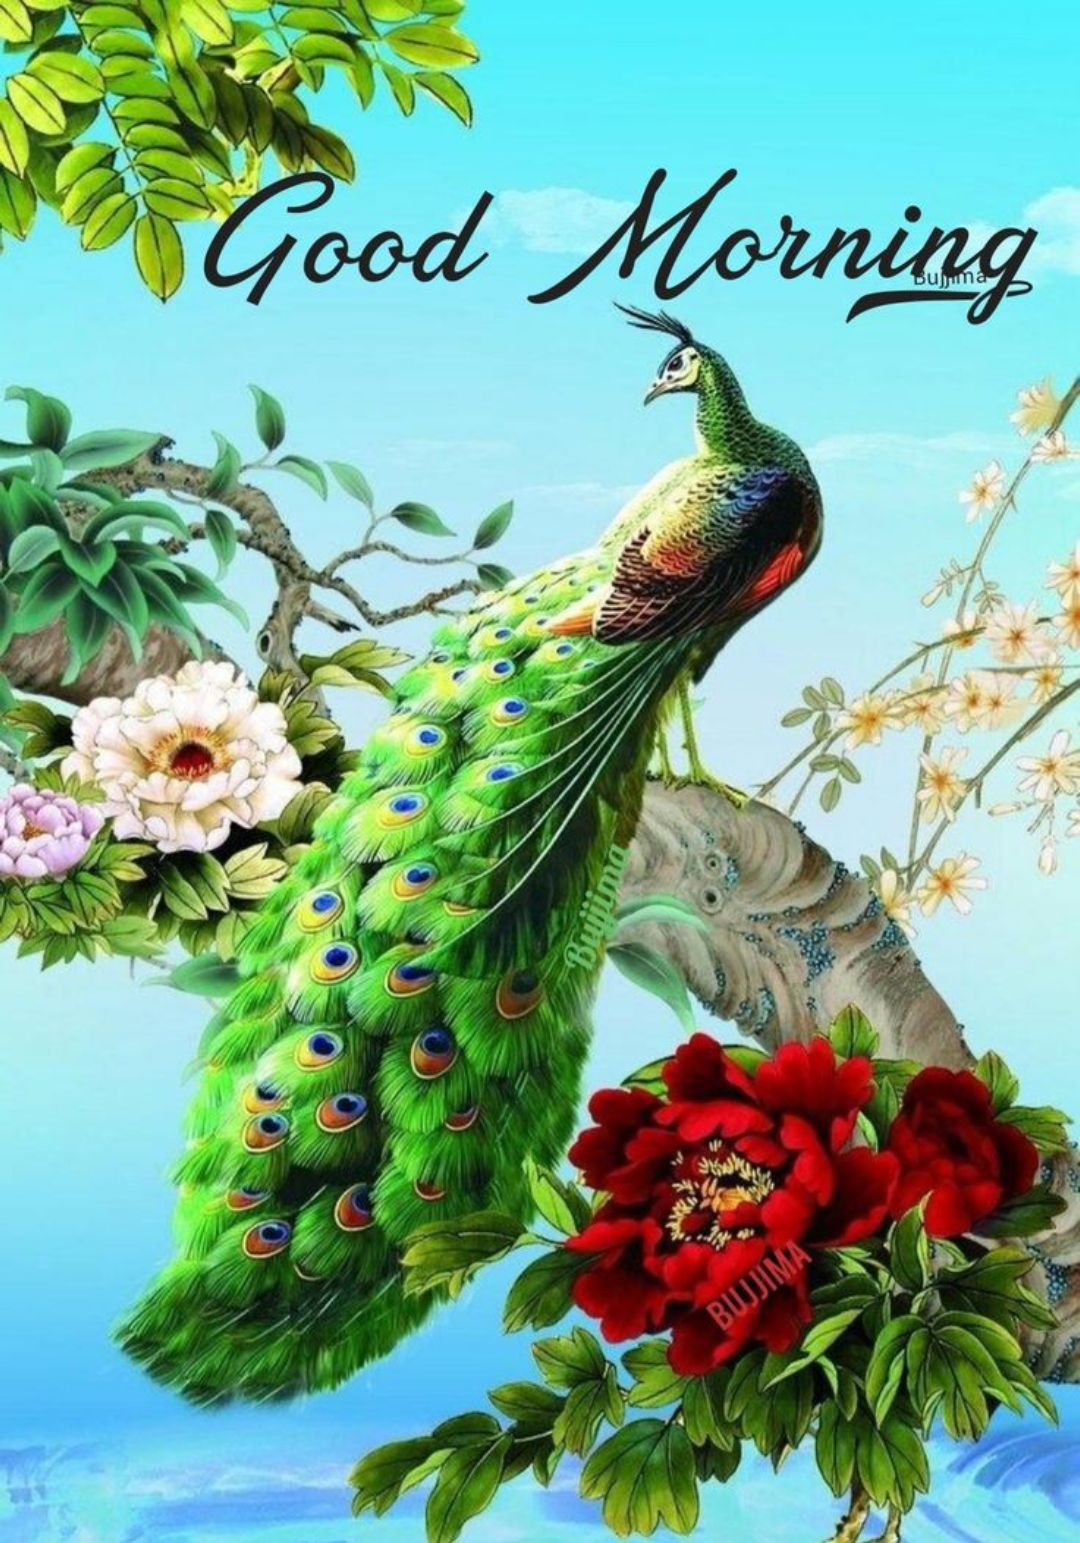 🖼 आर्ट और पेंटिंग्स - Good Morning Bujuma BWJIMA - ShareChat